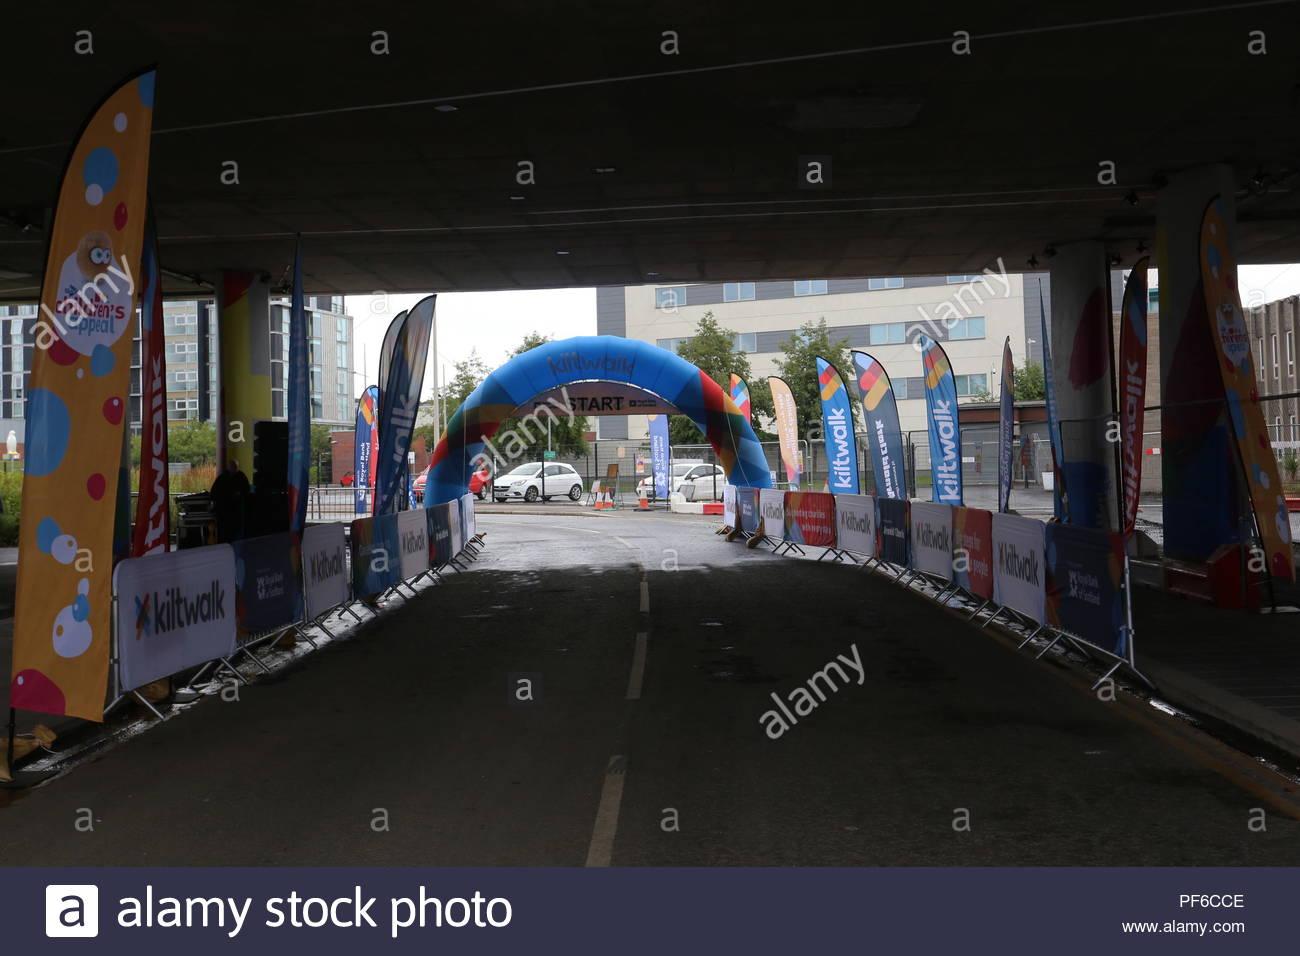 Start of Wee wander Kilt Walk under Tay Road Bridge Dundee Scotland  19th August 2018 - Stock Image